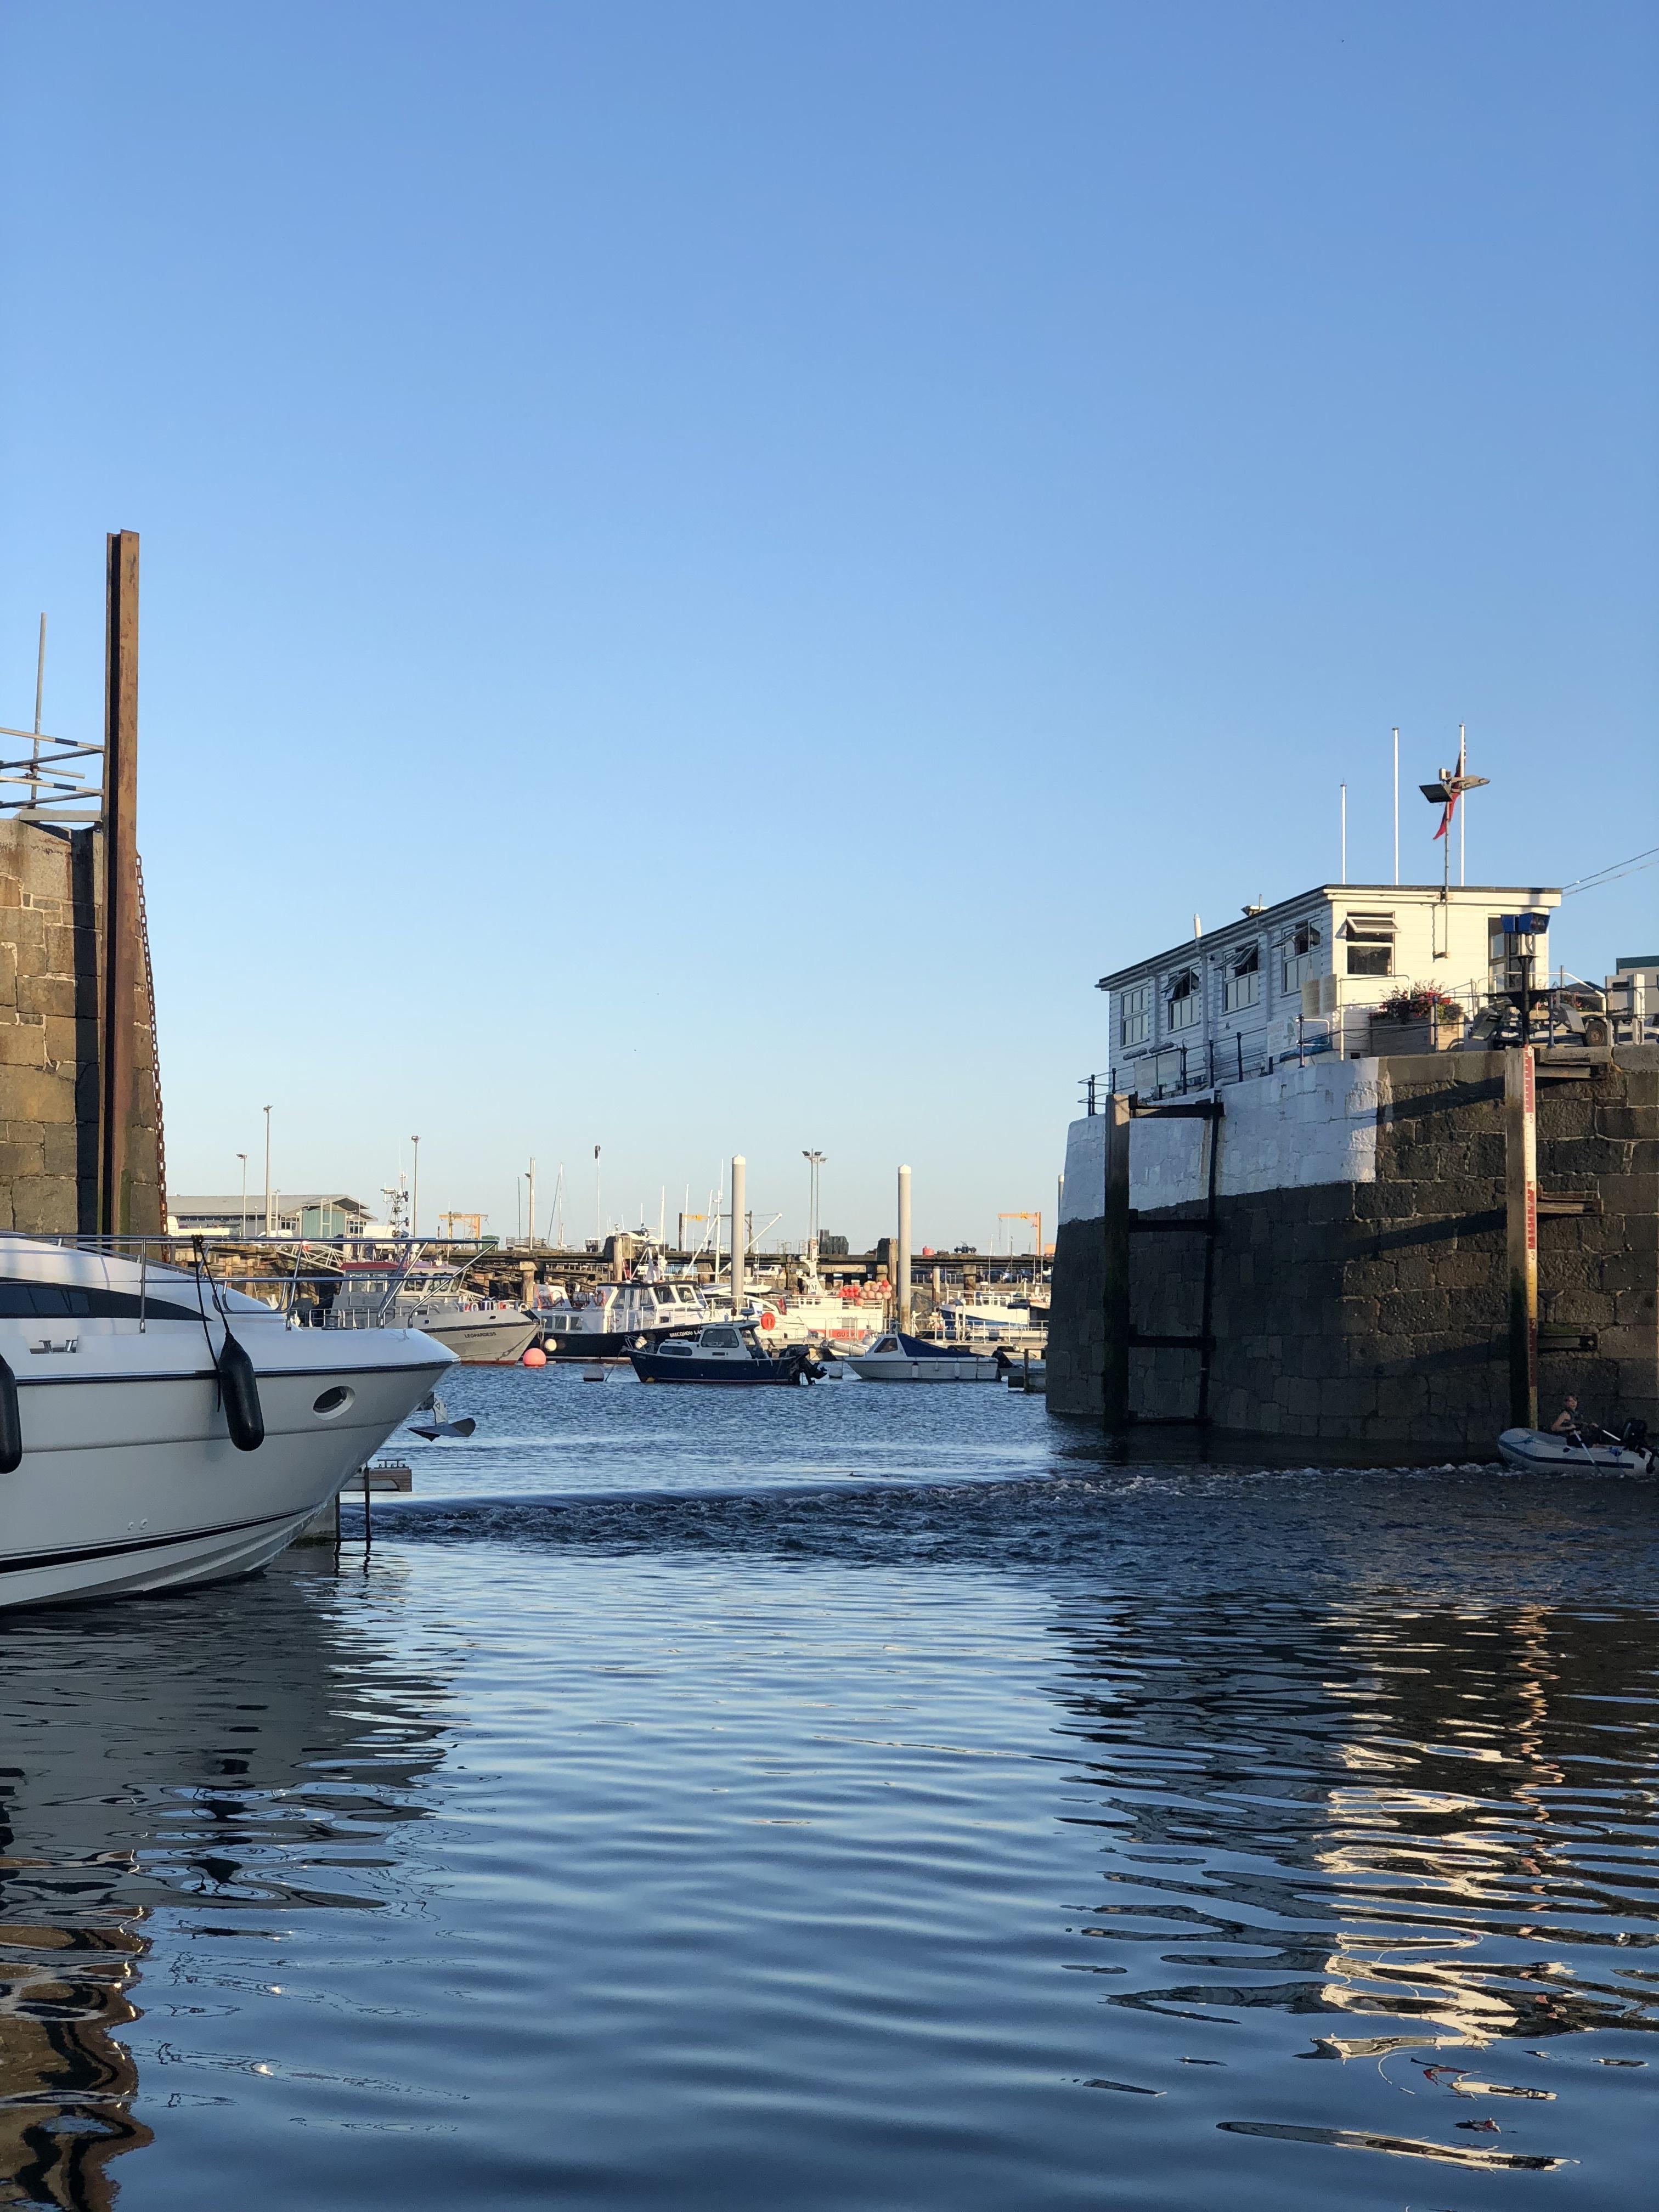 De haveningang van Saint Peter Port